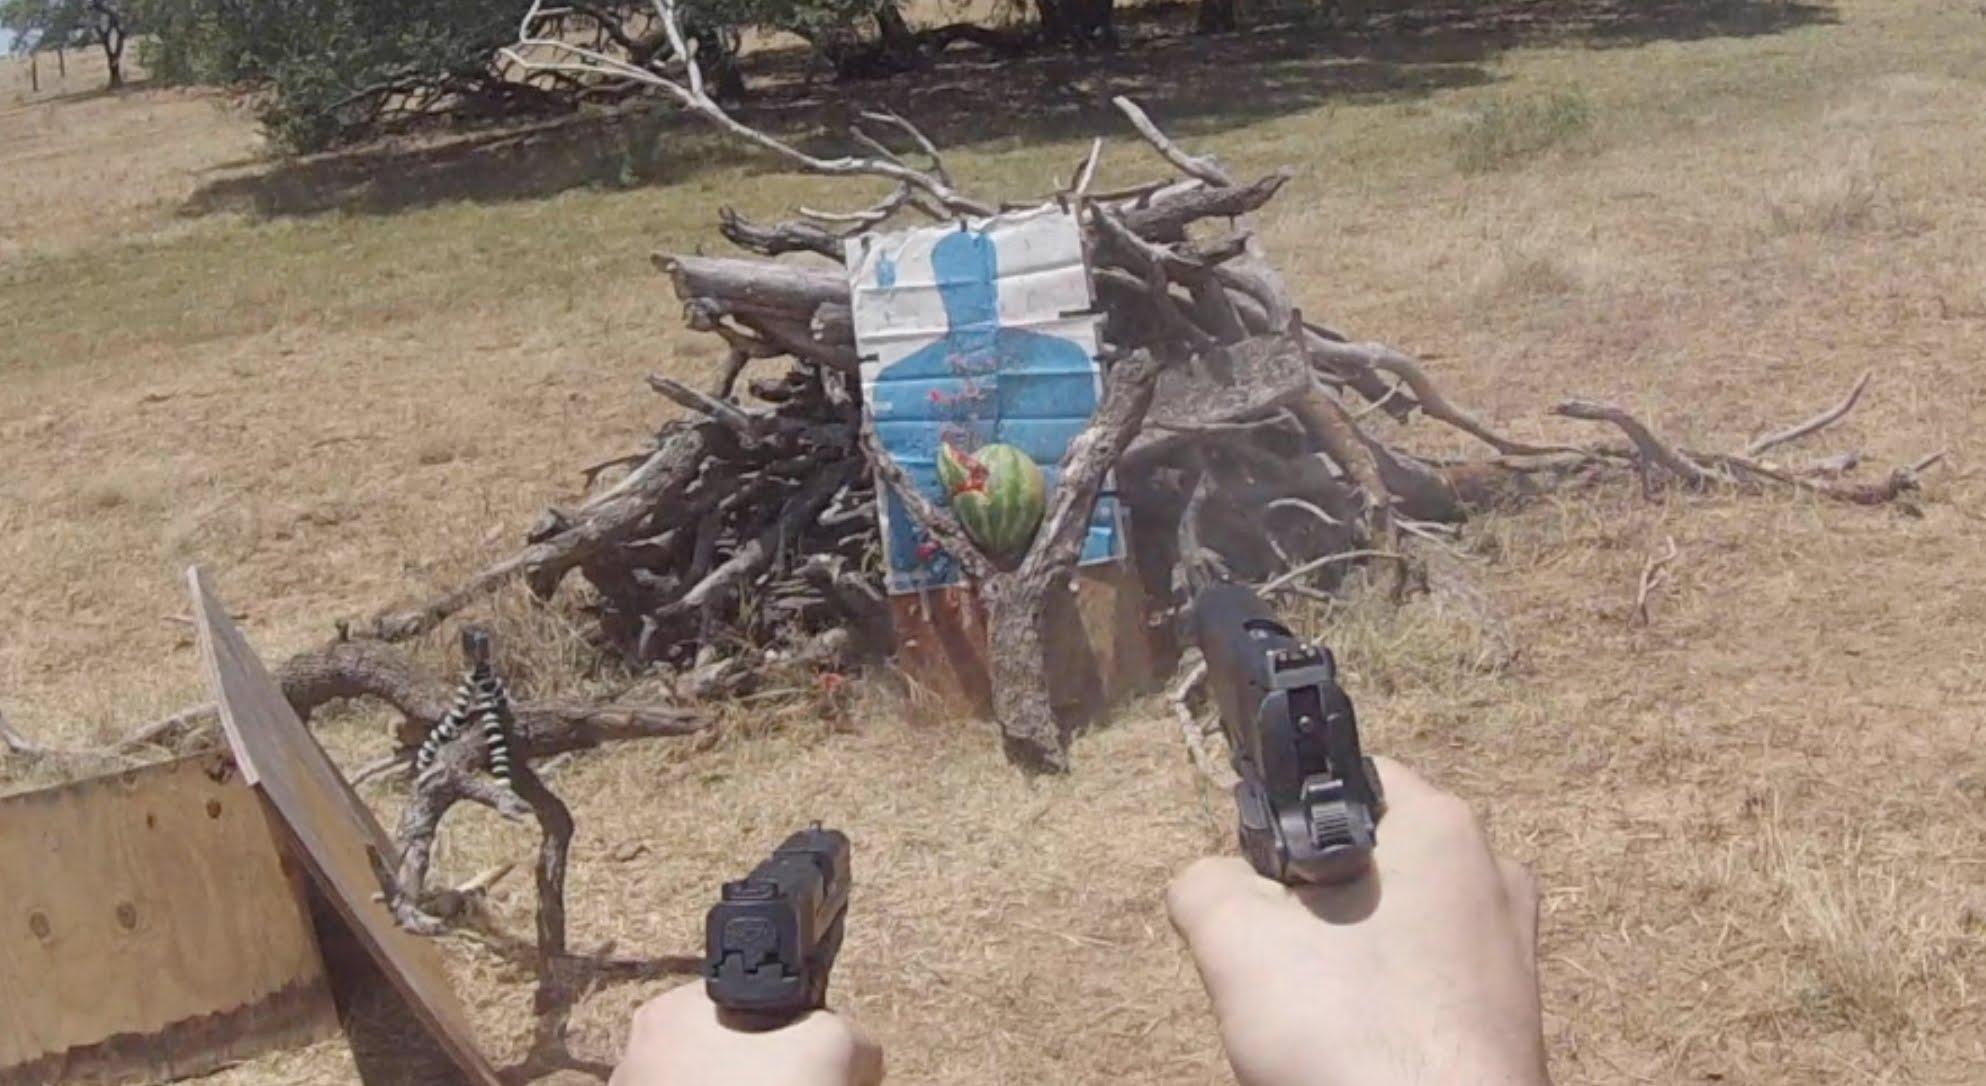 Testing Dual Wielded Pistol Accuracy